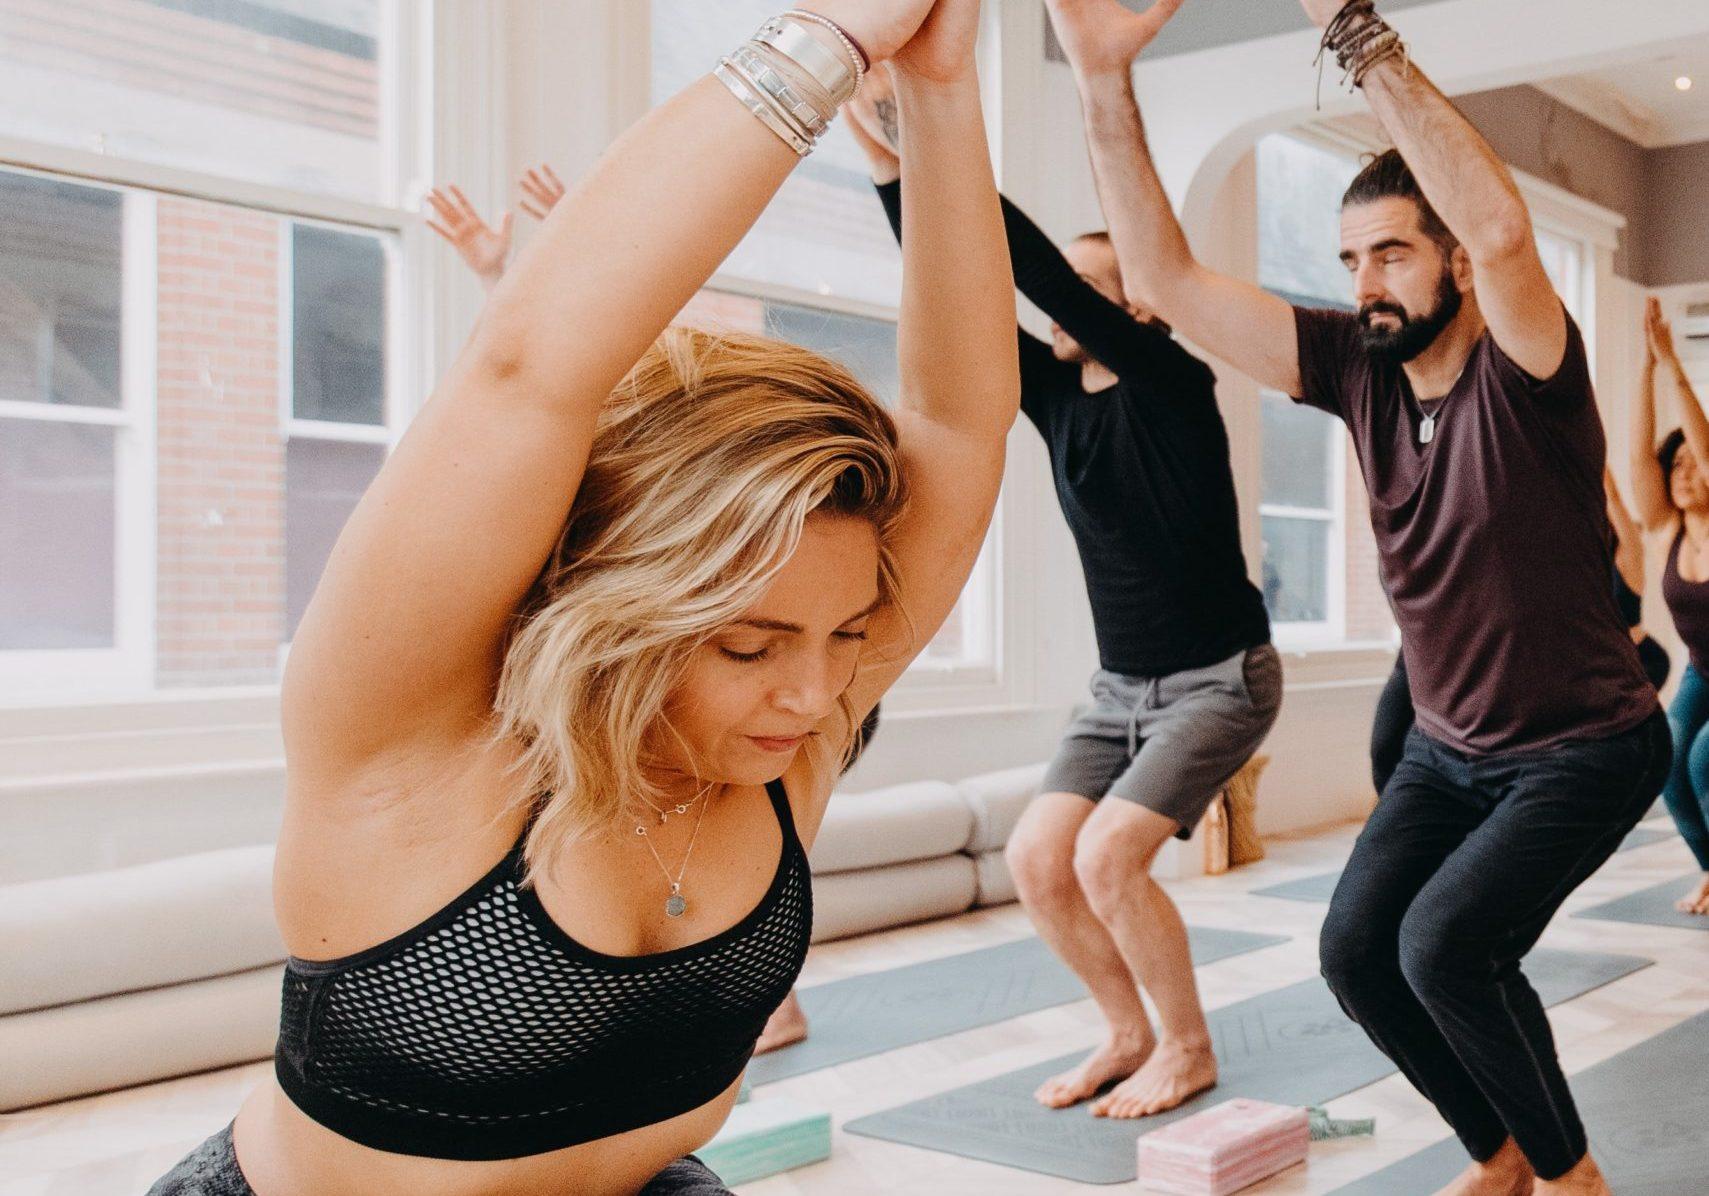 Coco-Yoga-2020-048-min-1.jpg